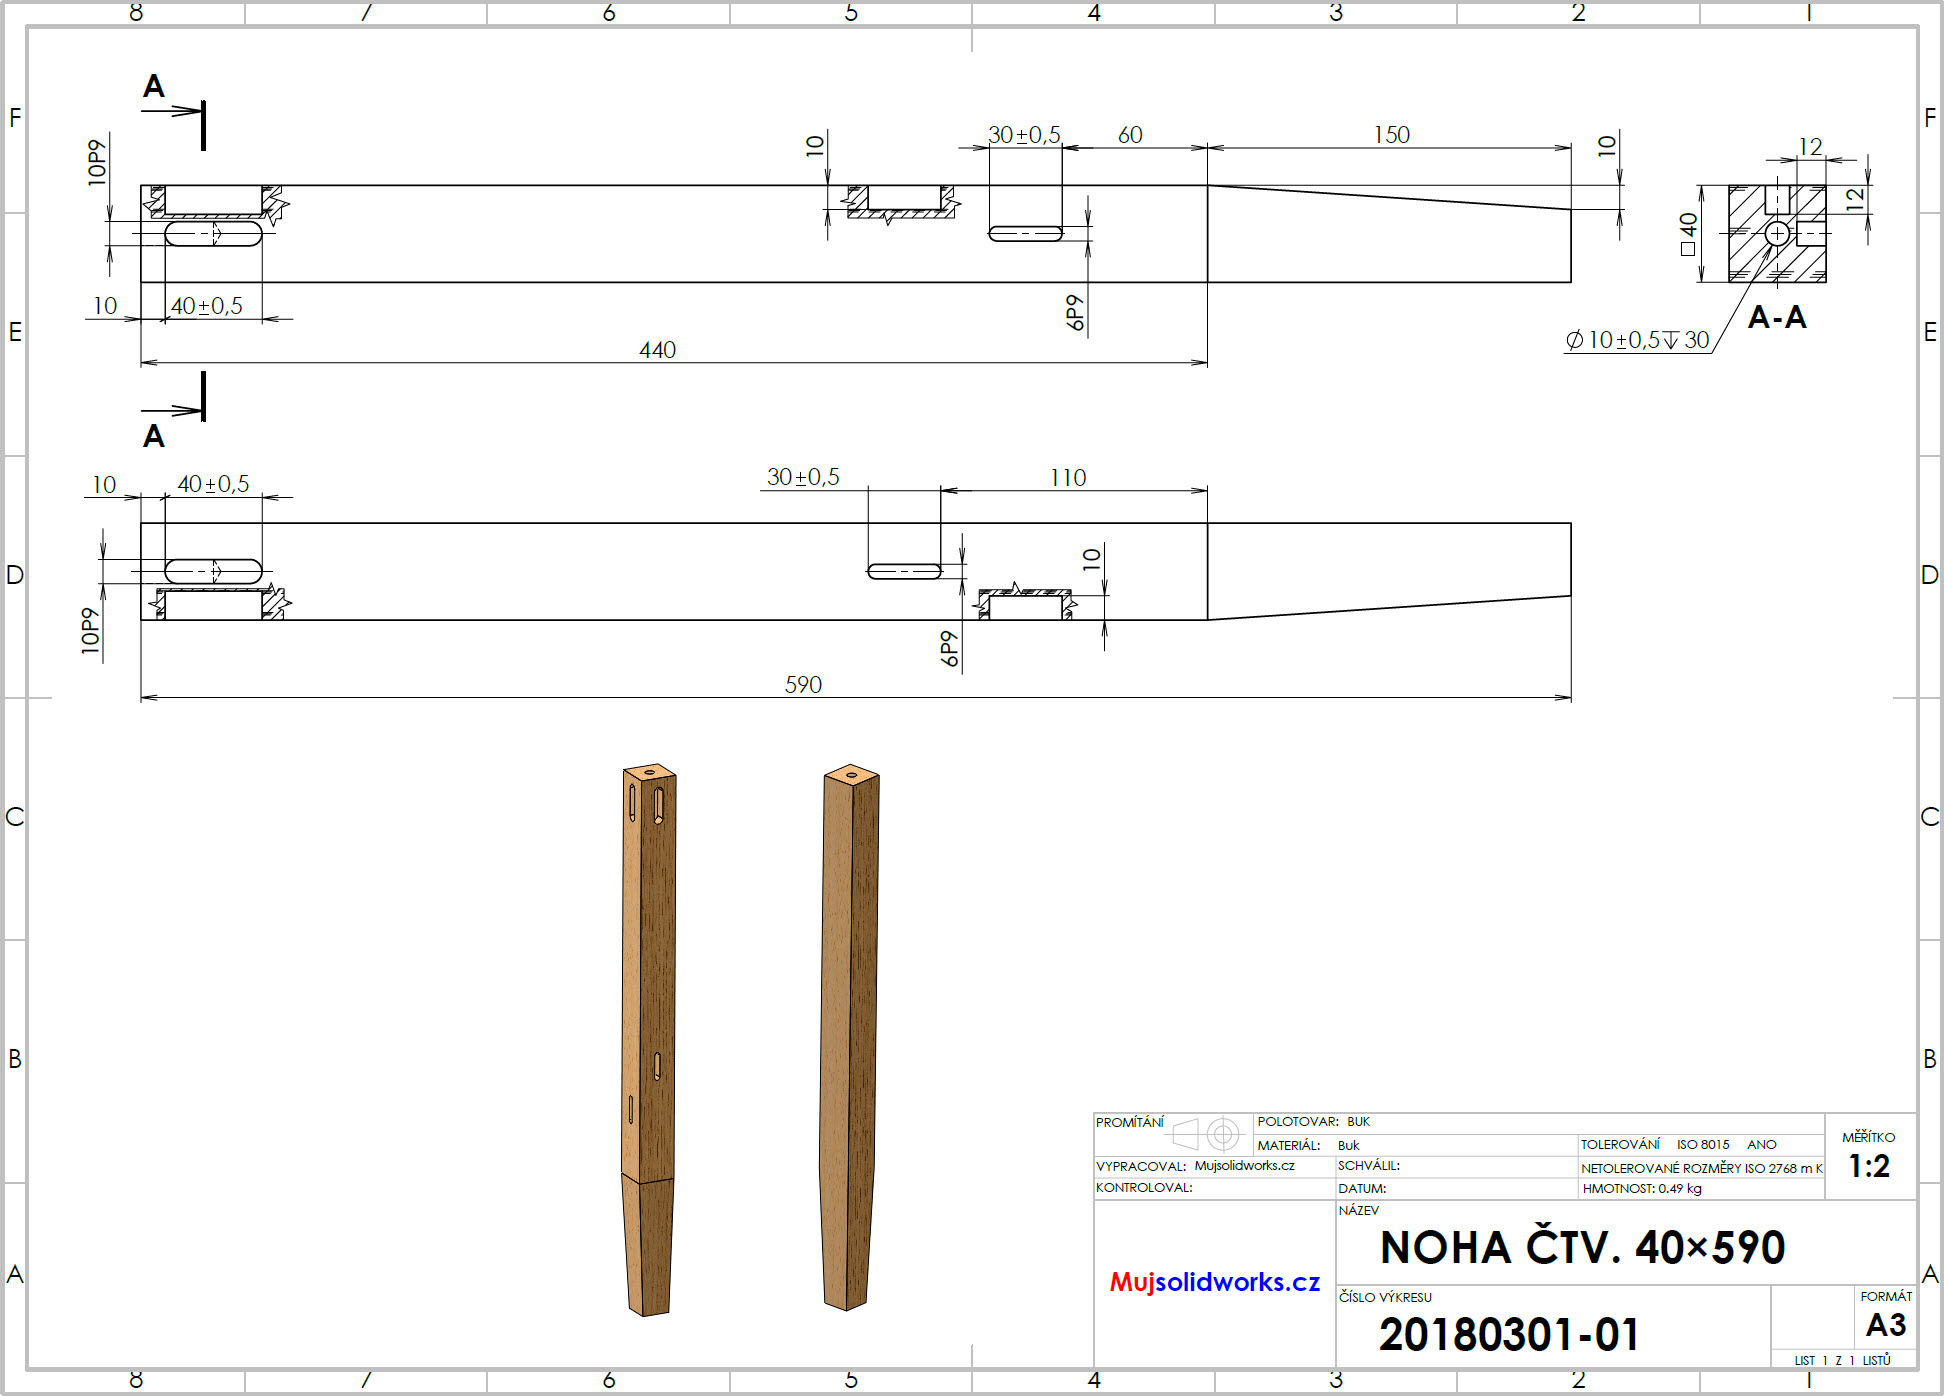 1-postup-navod-zacatecnik-sestava-animace-SolidWorks-tutorial-noha